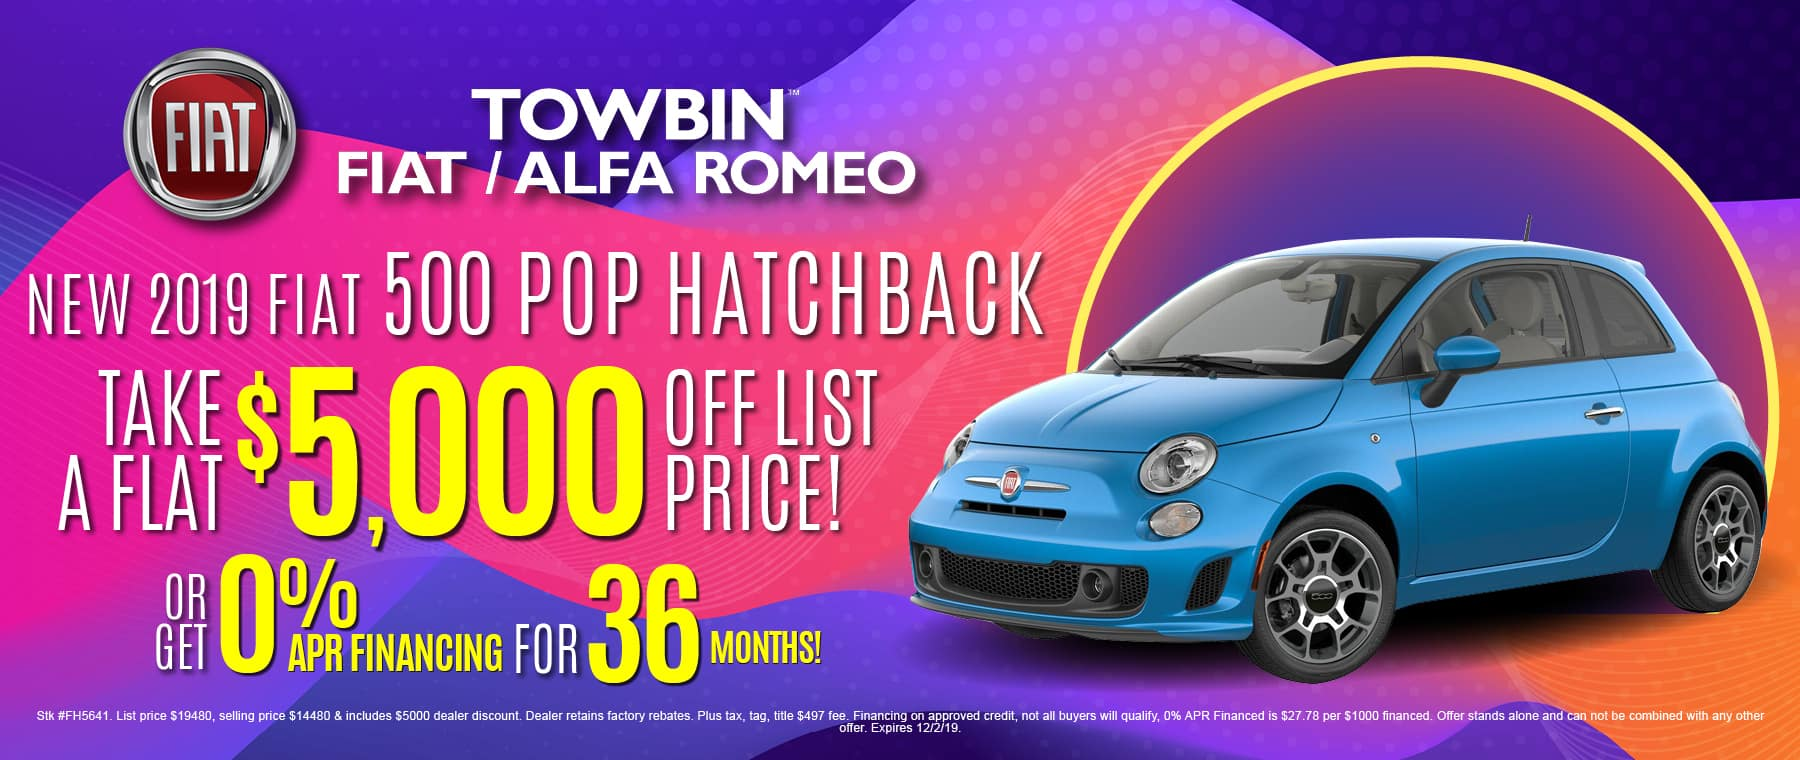 Fiat Las Vegas >> Towbin Fiat Fiat Dealer In Las Vegas Nv